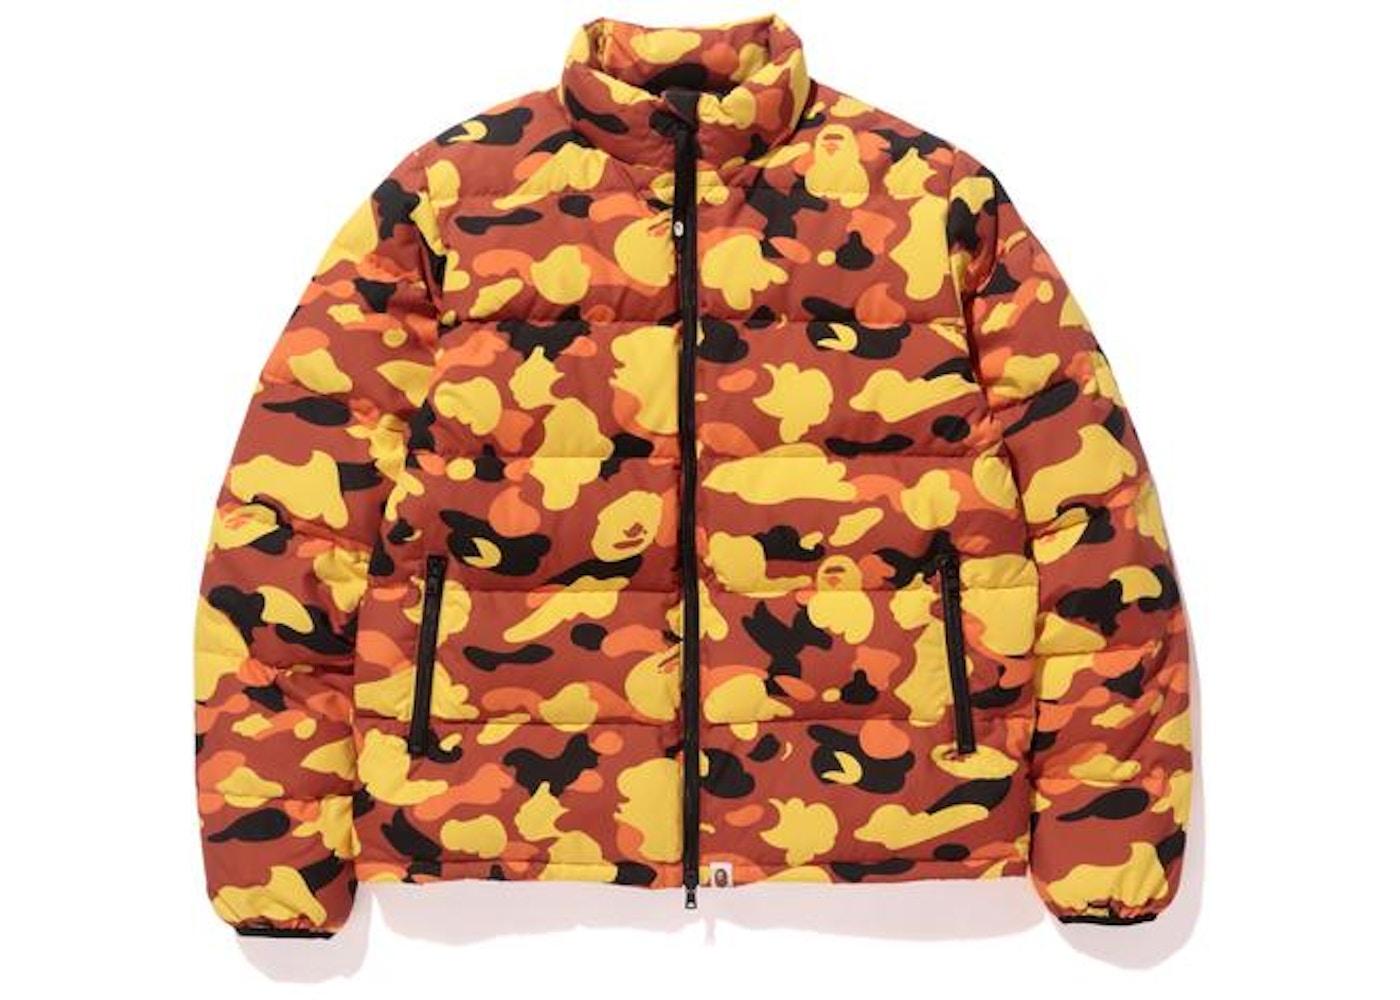 55f3b972 BAPE 1st Camo Down Jacket Jacket Orange -